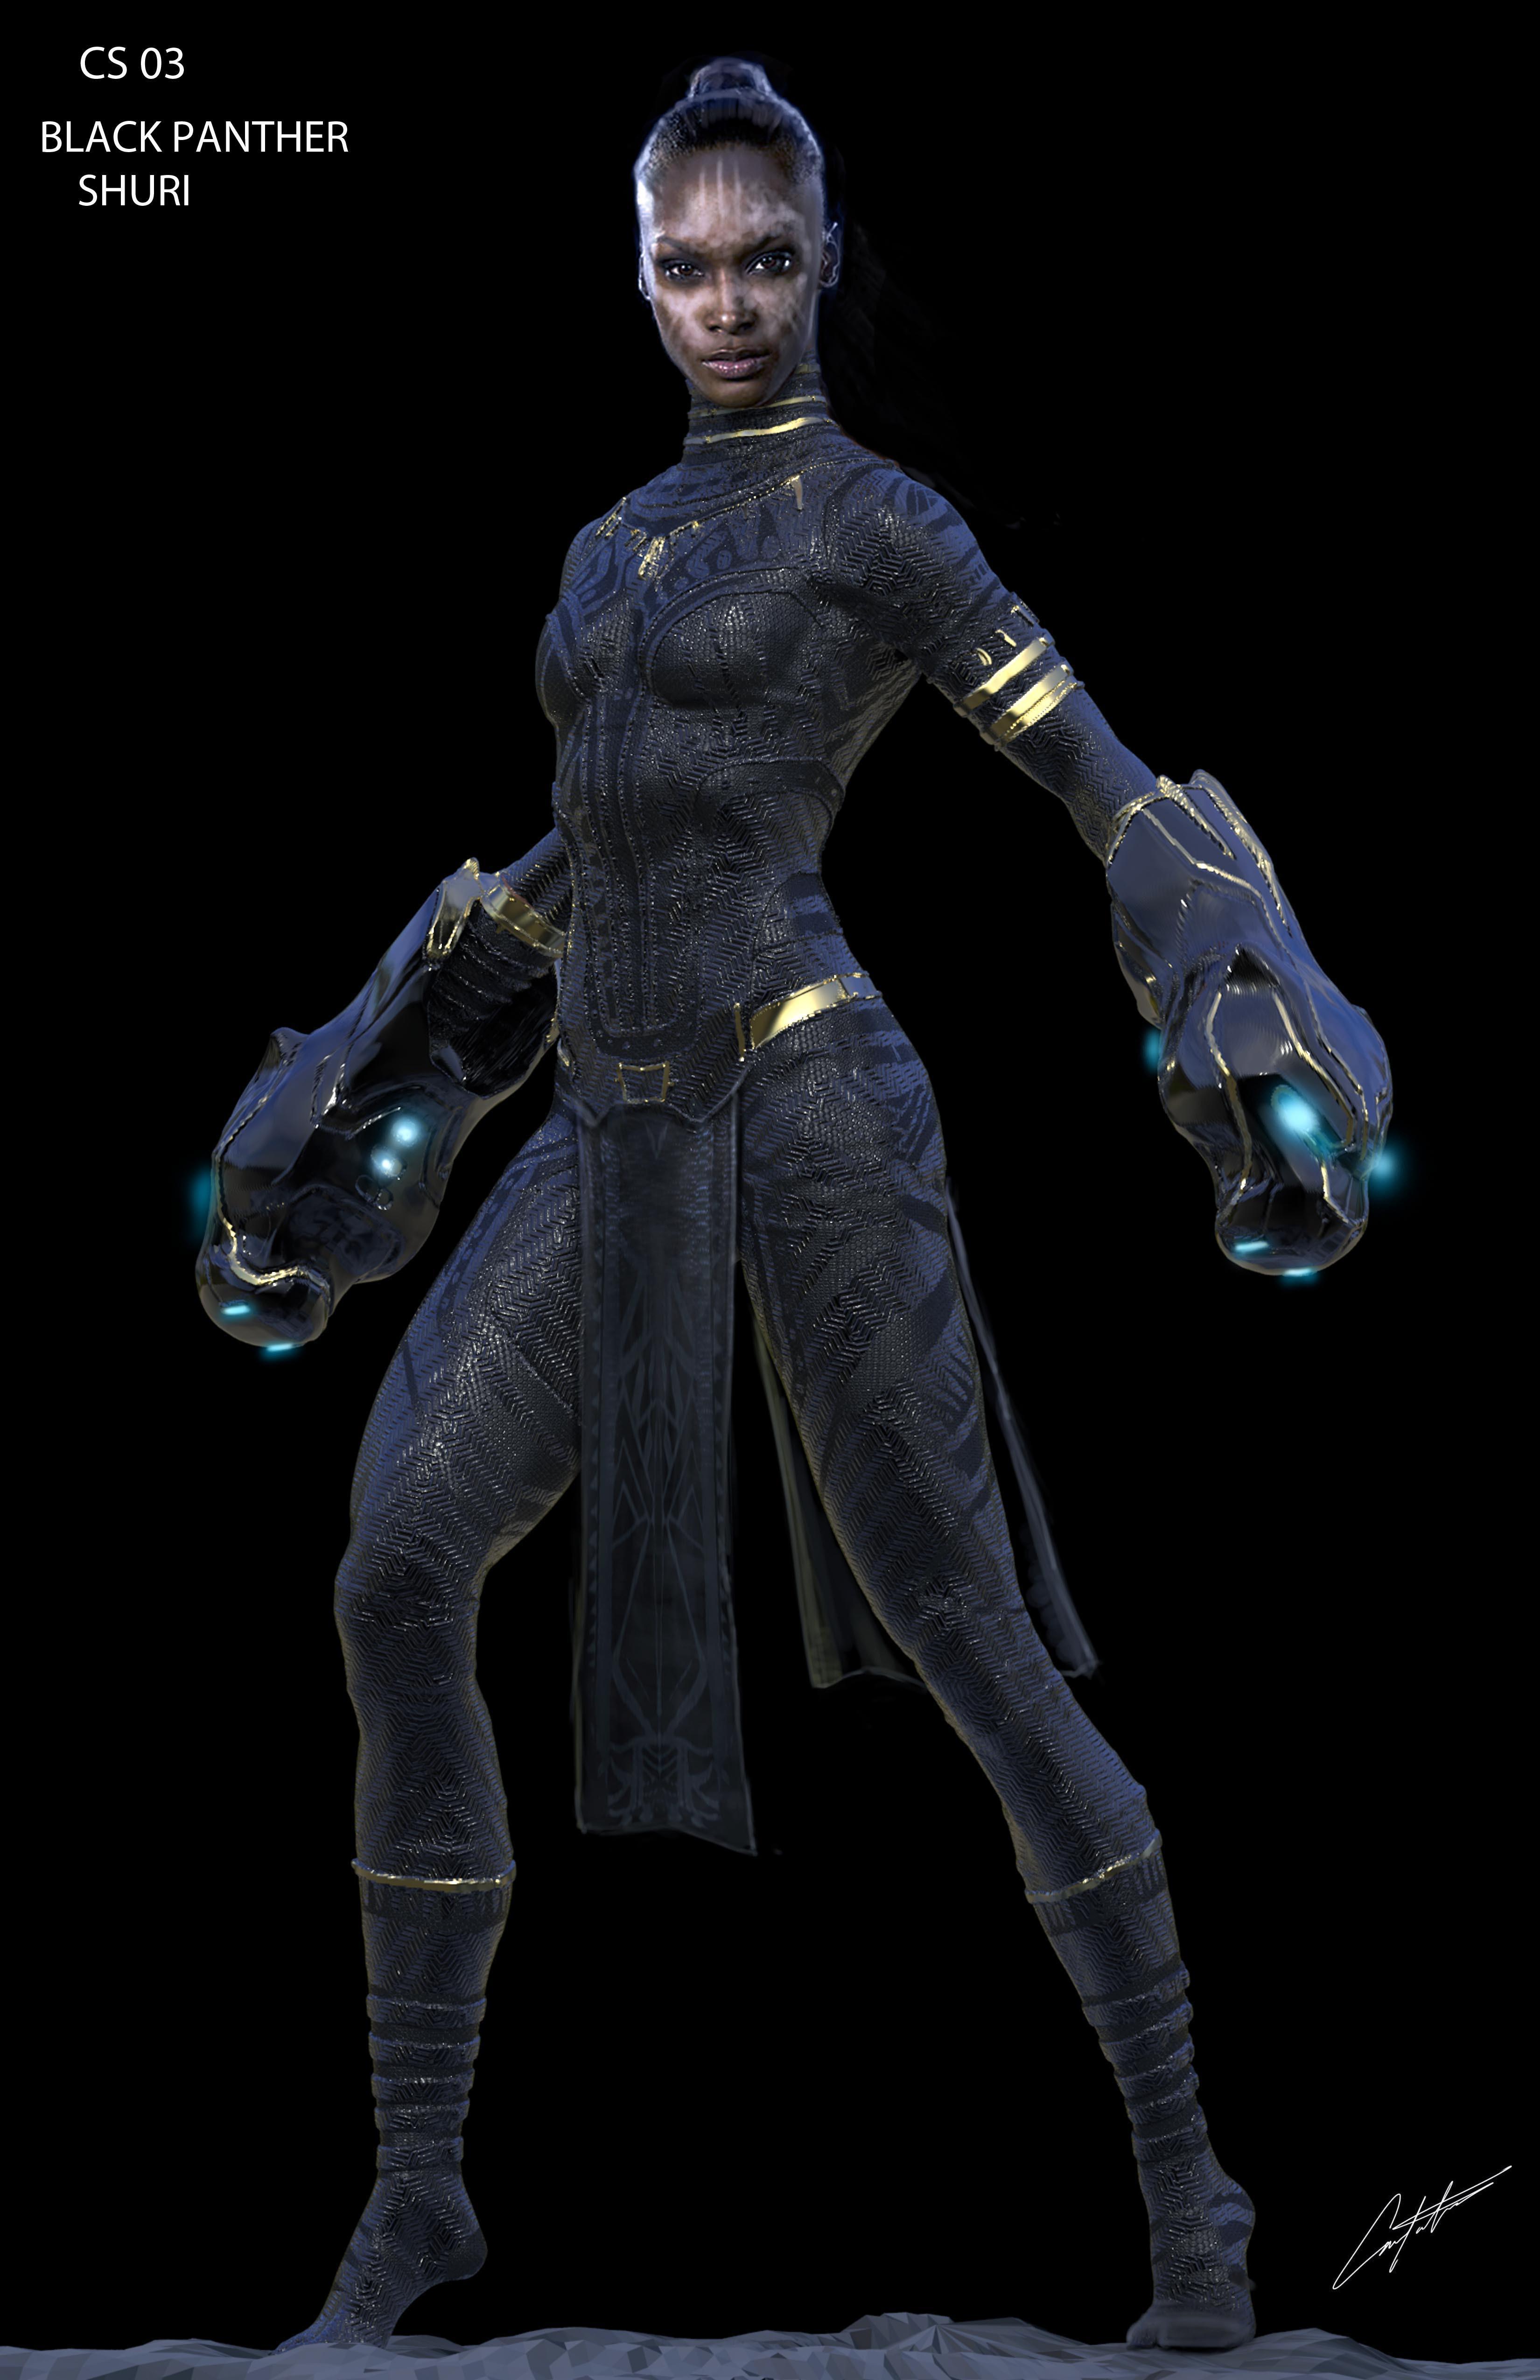 Black Panther Shuri Costume Concept Design